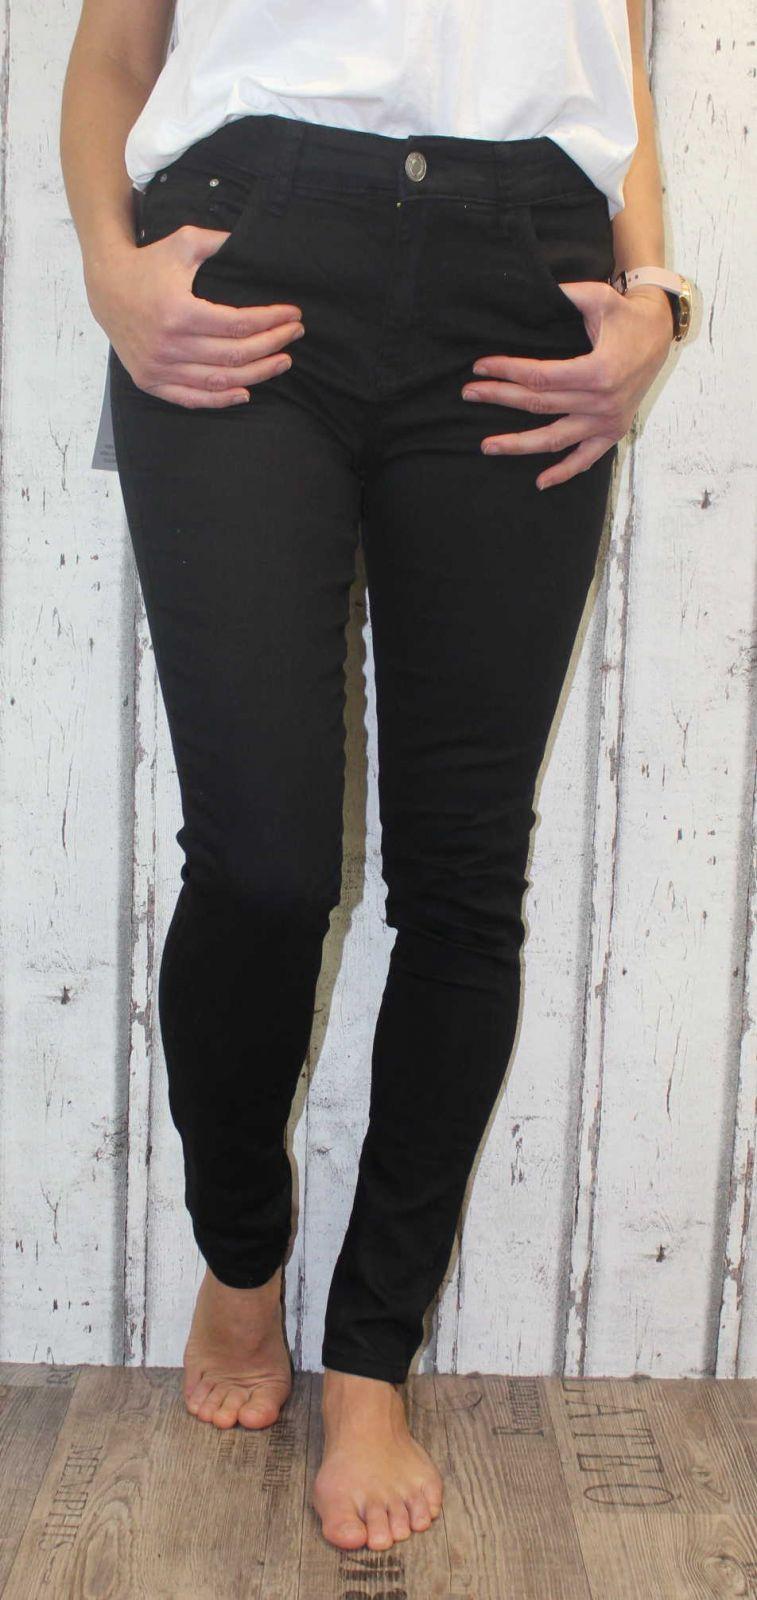 dámské elastické džíny, džíny slimky, dívčí slimky, dívčí elastické džíny, černé džíny, džíny s vysokým pasem, dámské oblečení, dámské kalhoty, dívčí džíny Denim